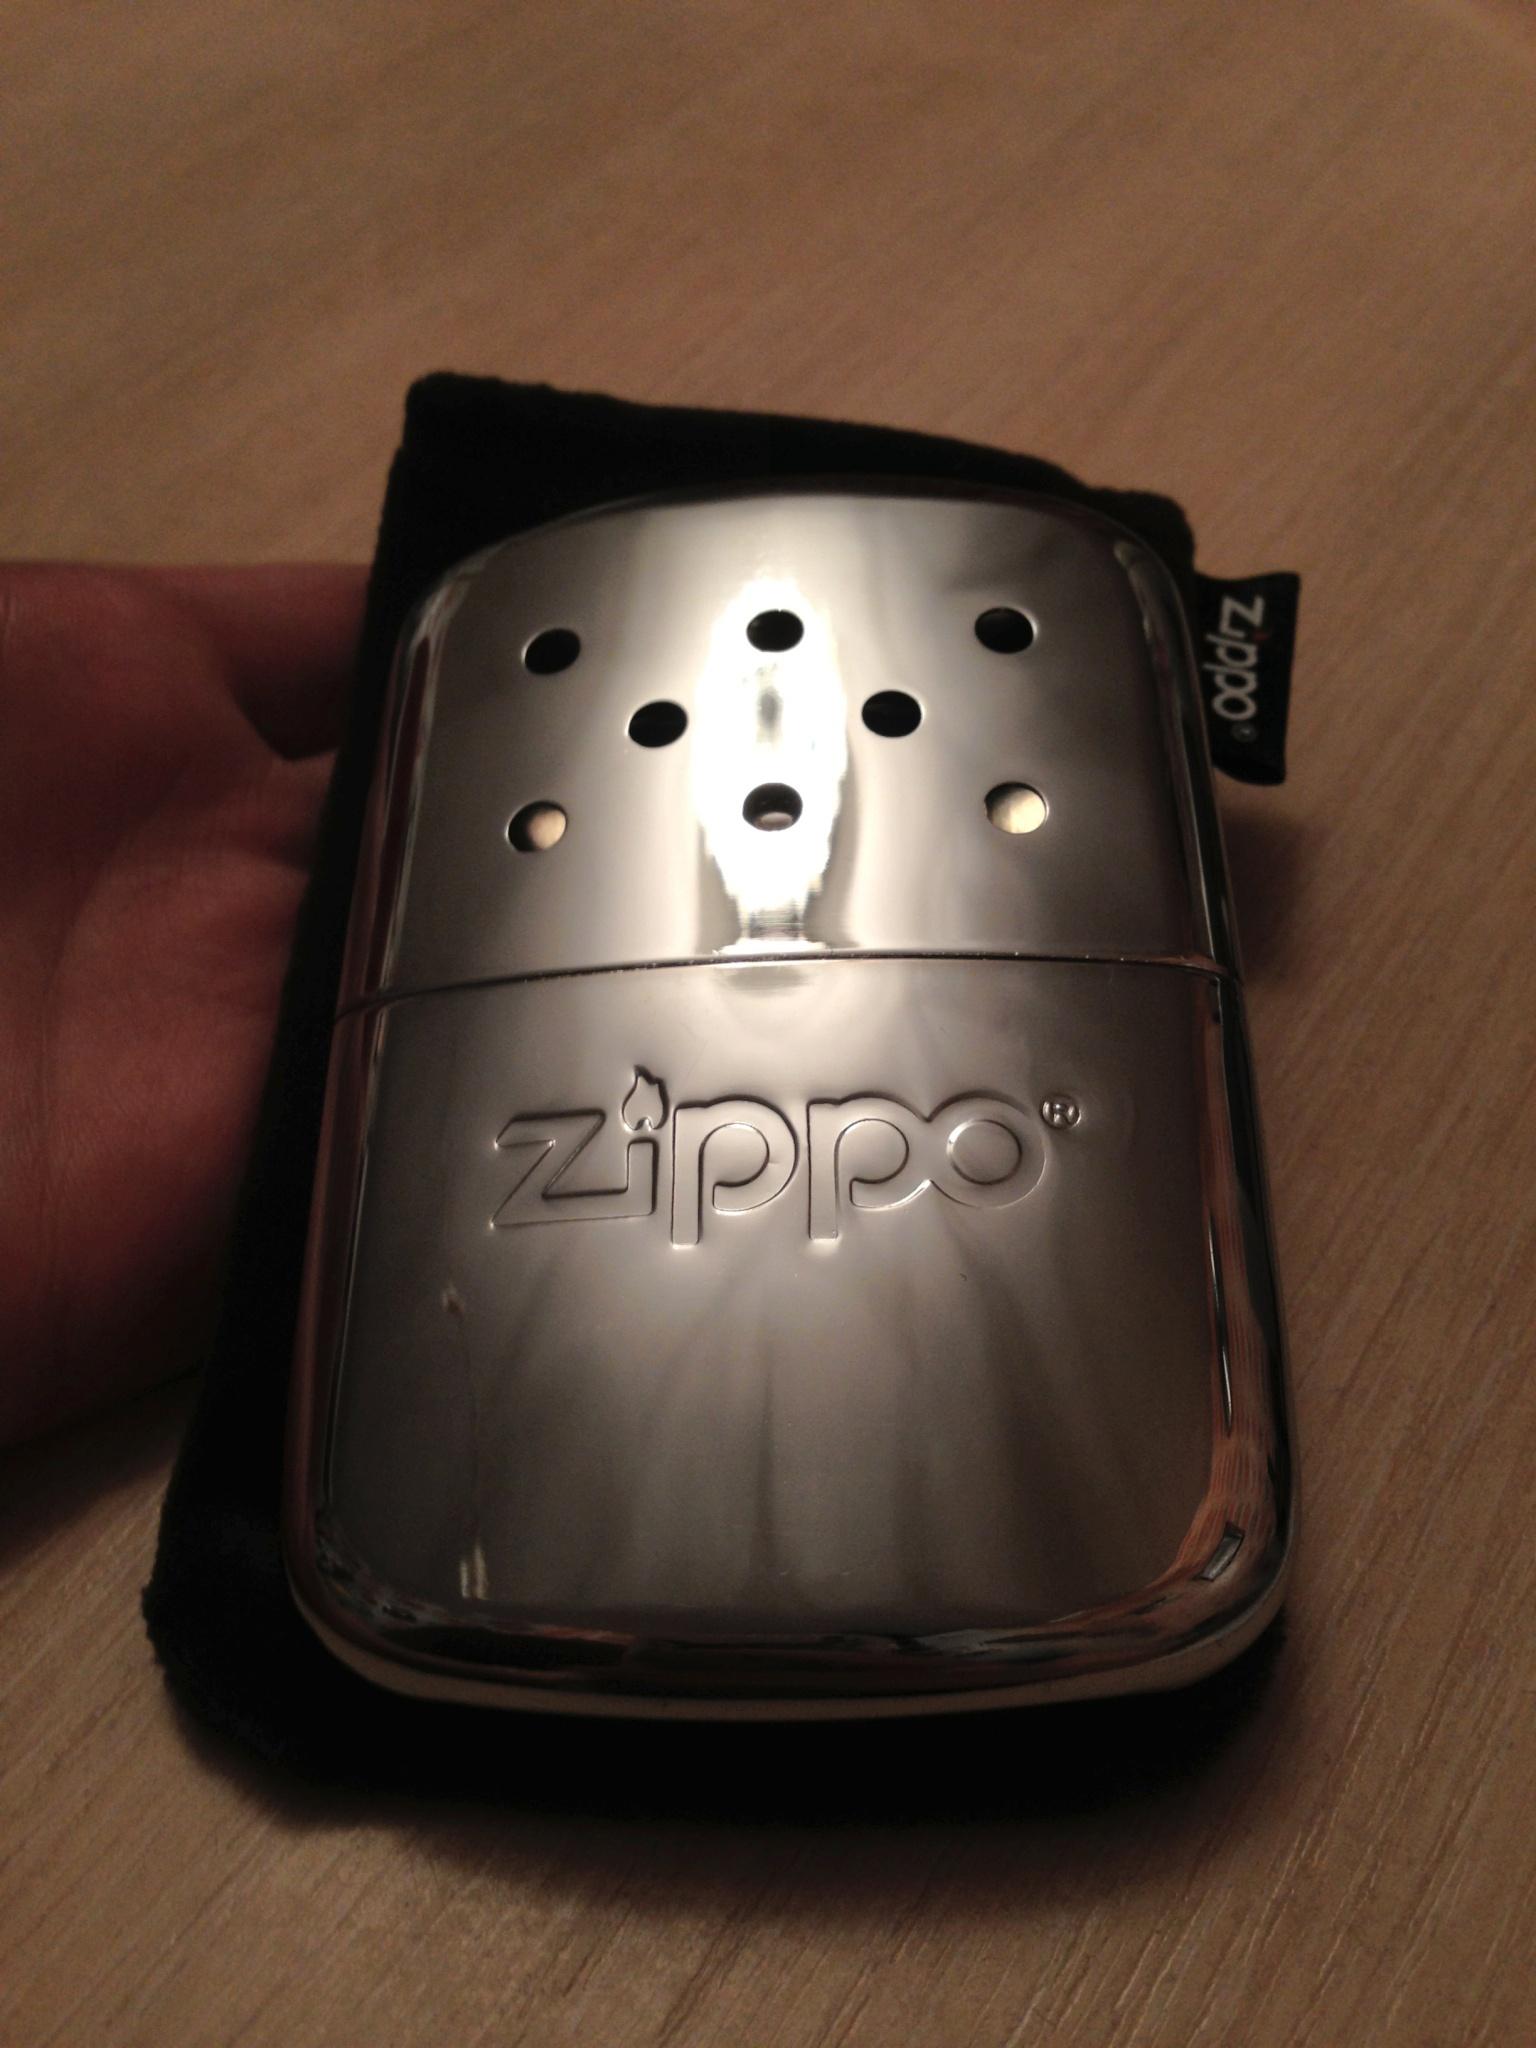 zippo programma